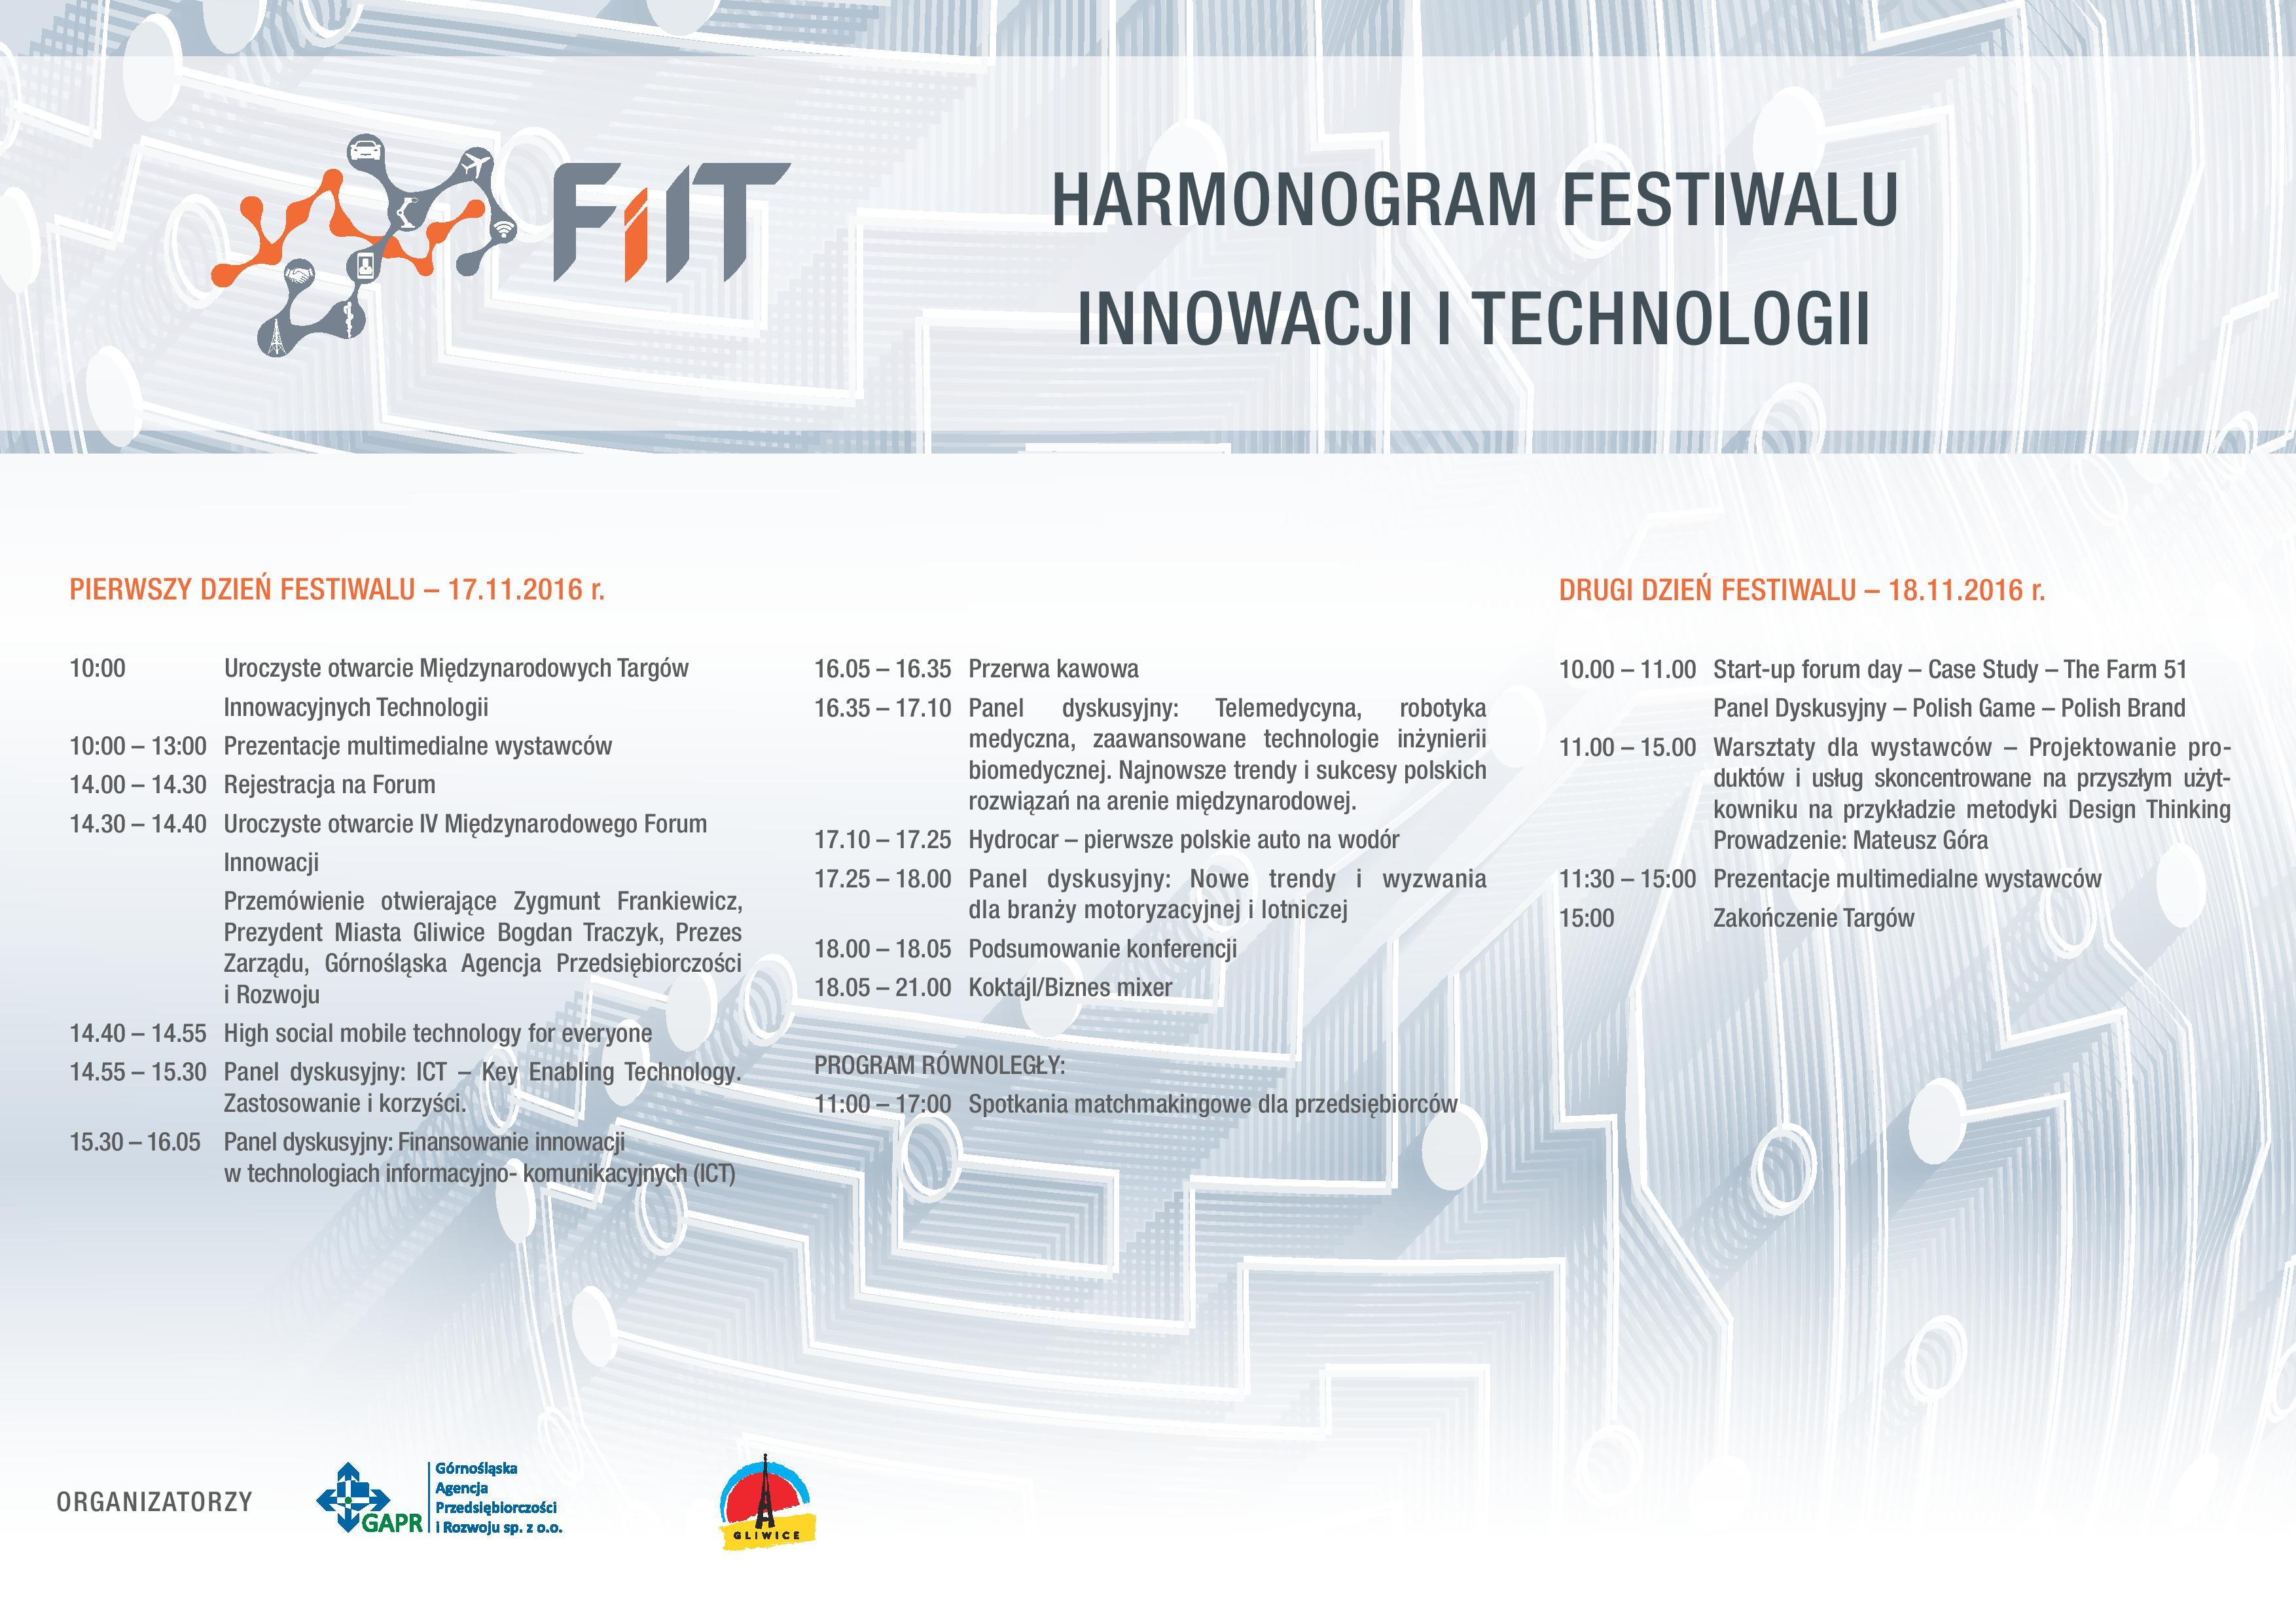 Festiwal Innowacji i Technologii